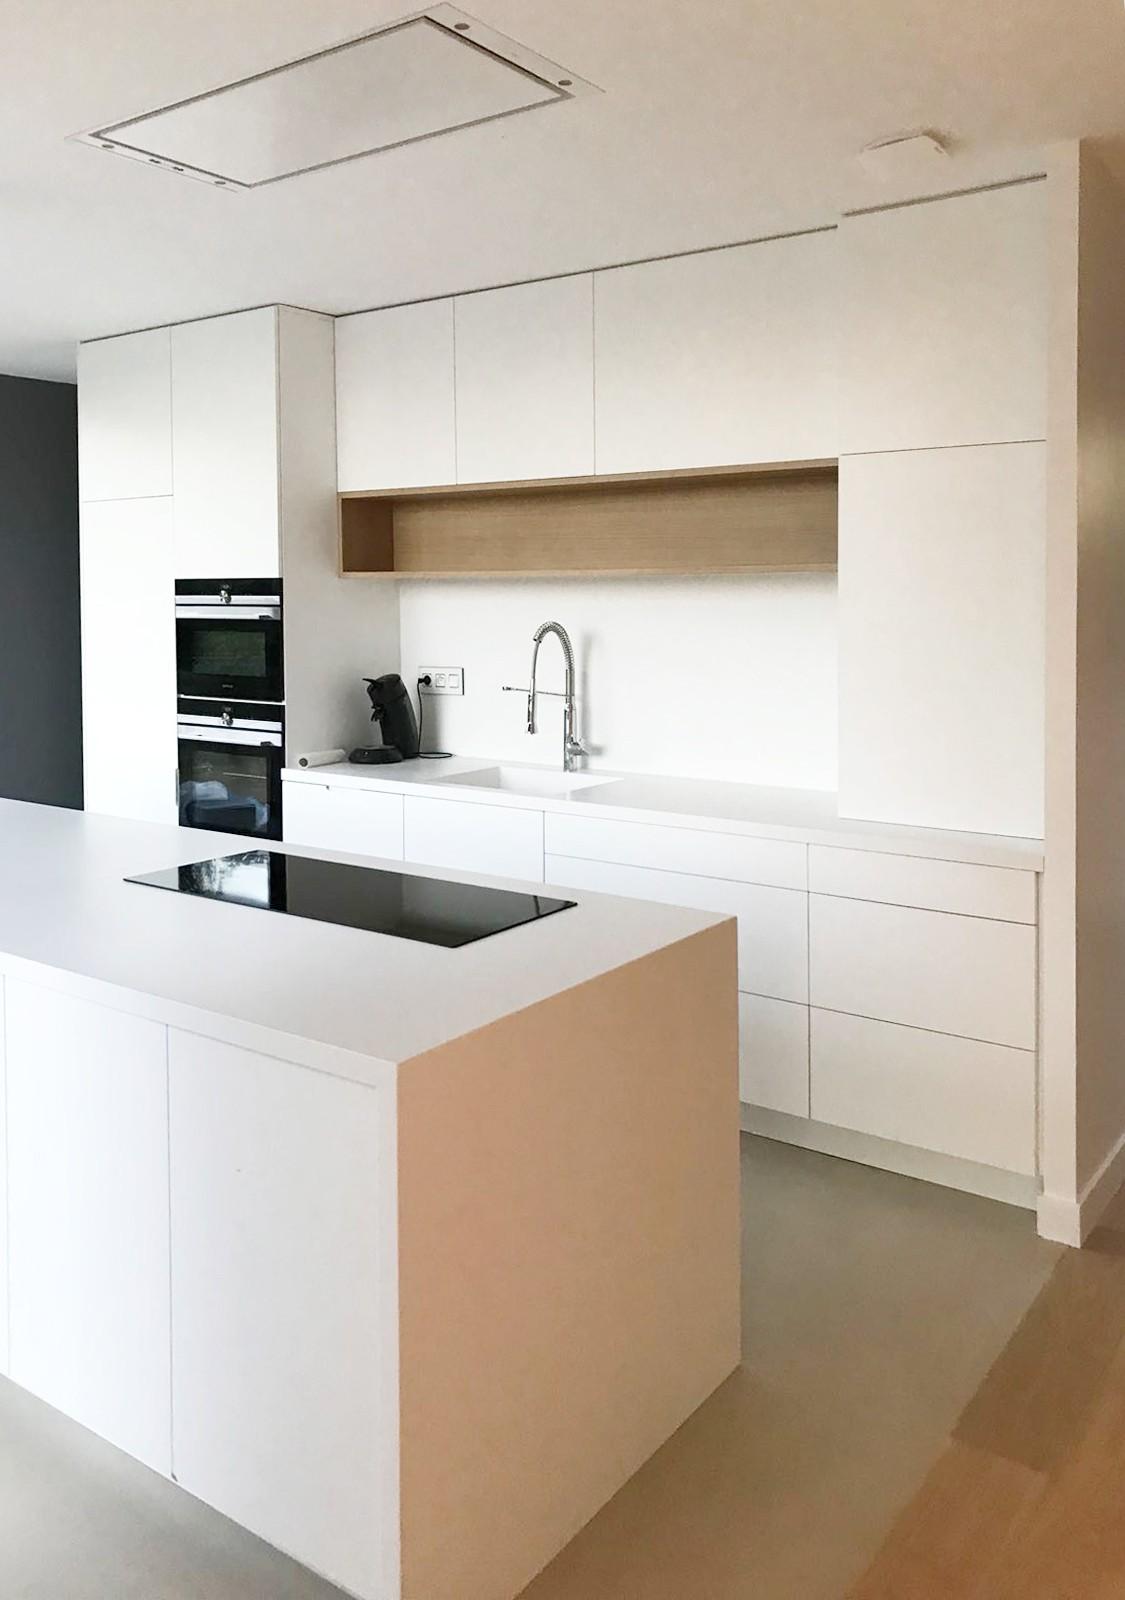 asb-architecture-maison-contemporaine-toiture-terrasse-cuisine minimaliste